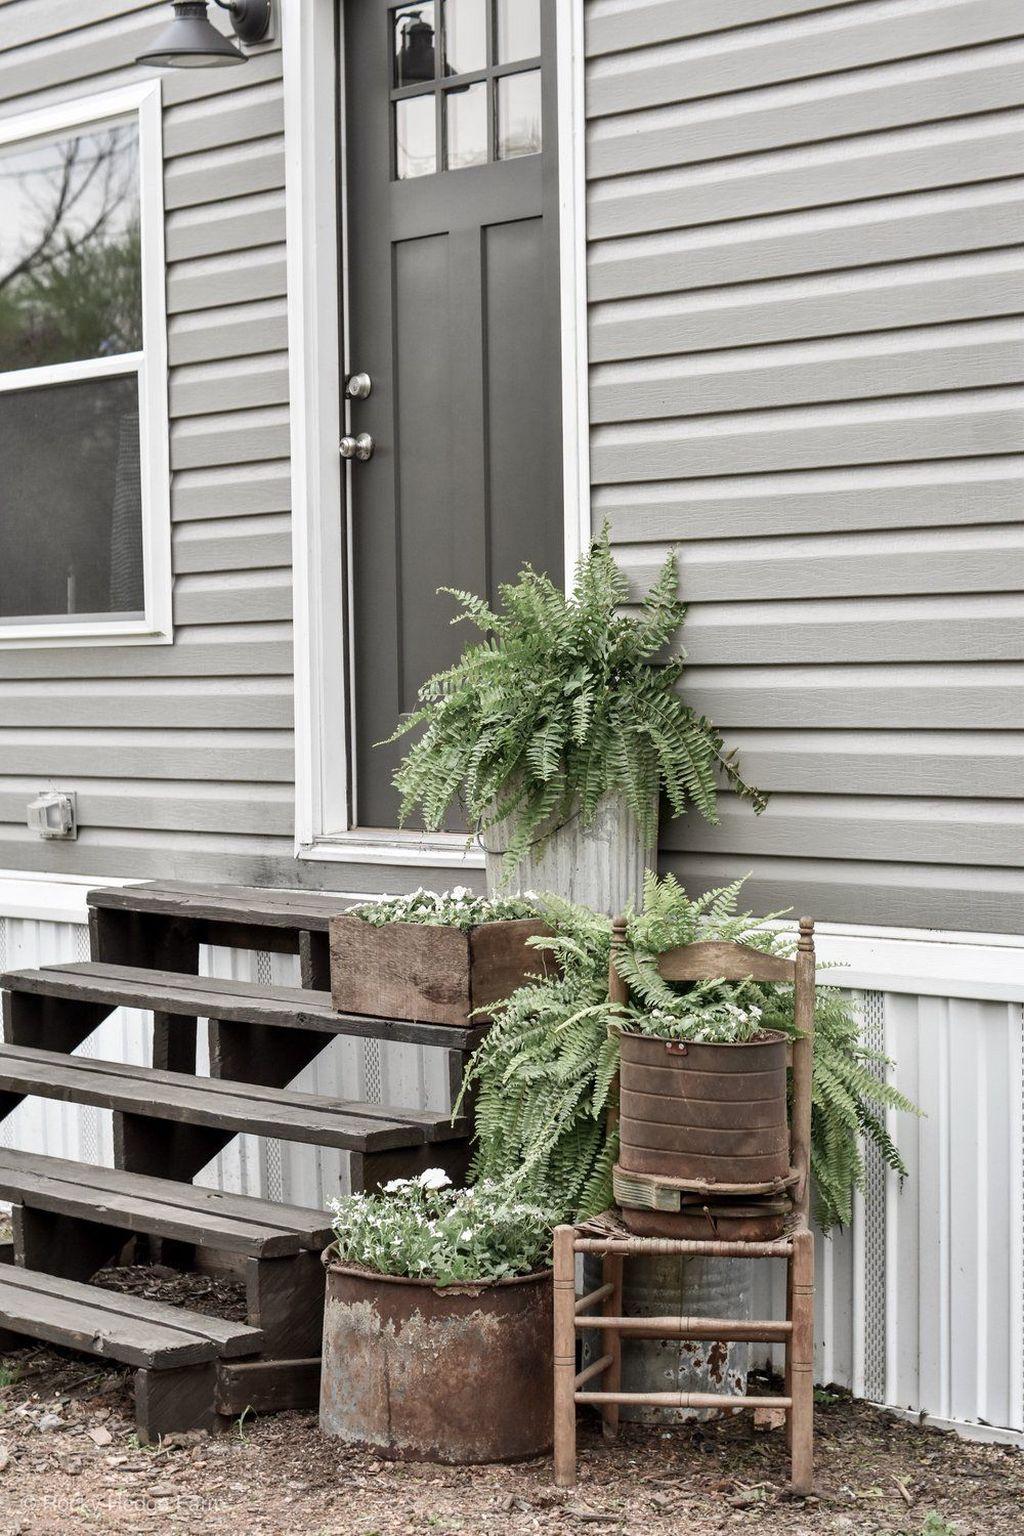 Inspiring Spring Planters Design Ideas For Front Door 19